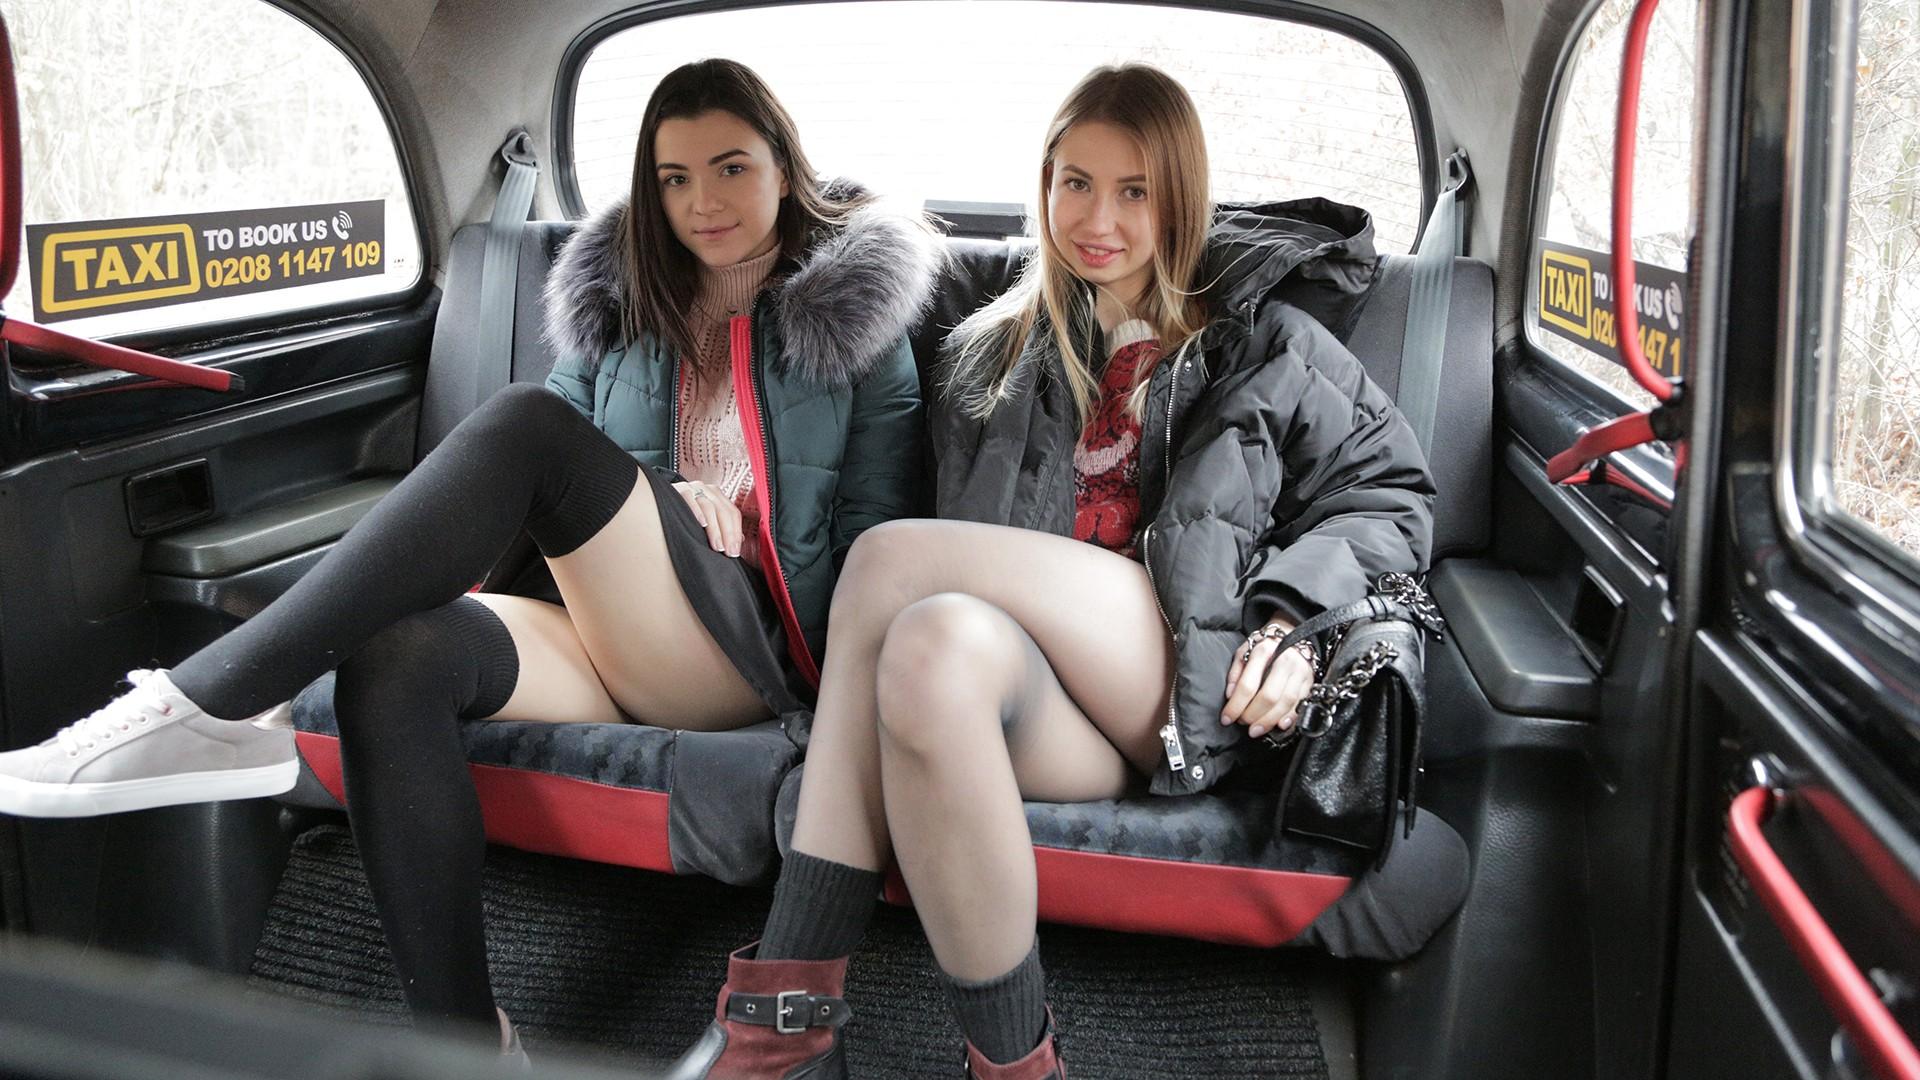 Lesbian taxi threesome wild orgasms - Female Fake Taxi